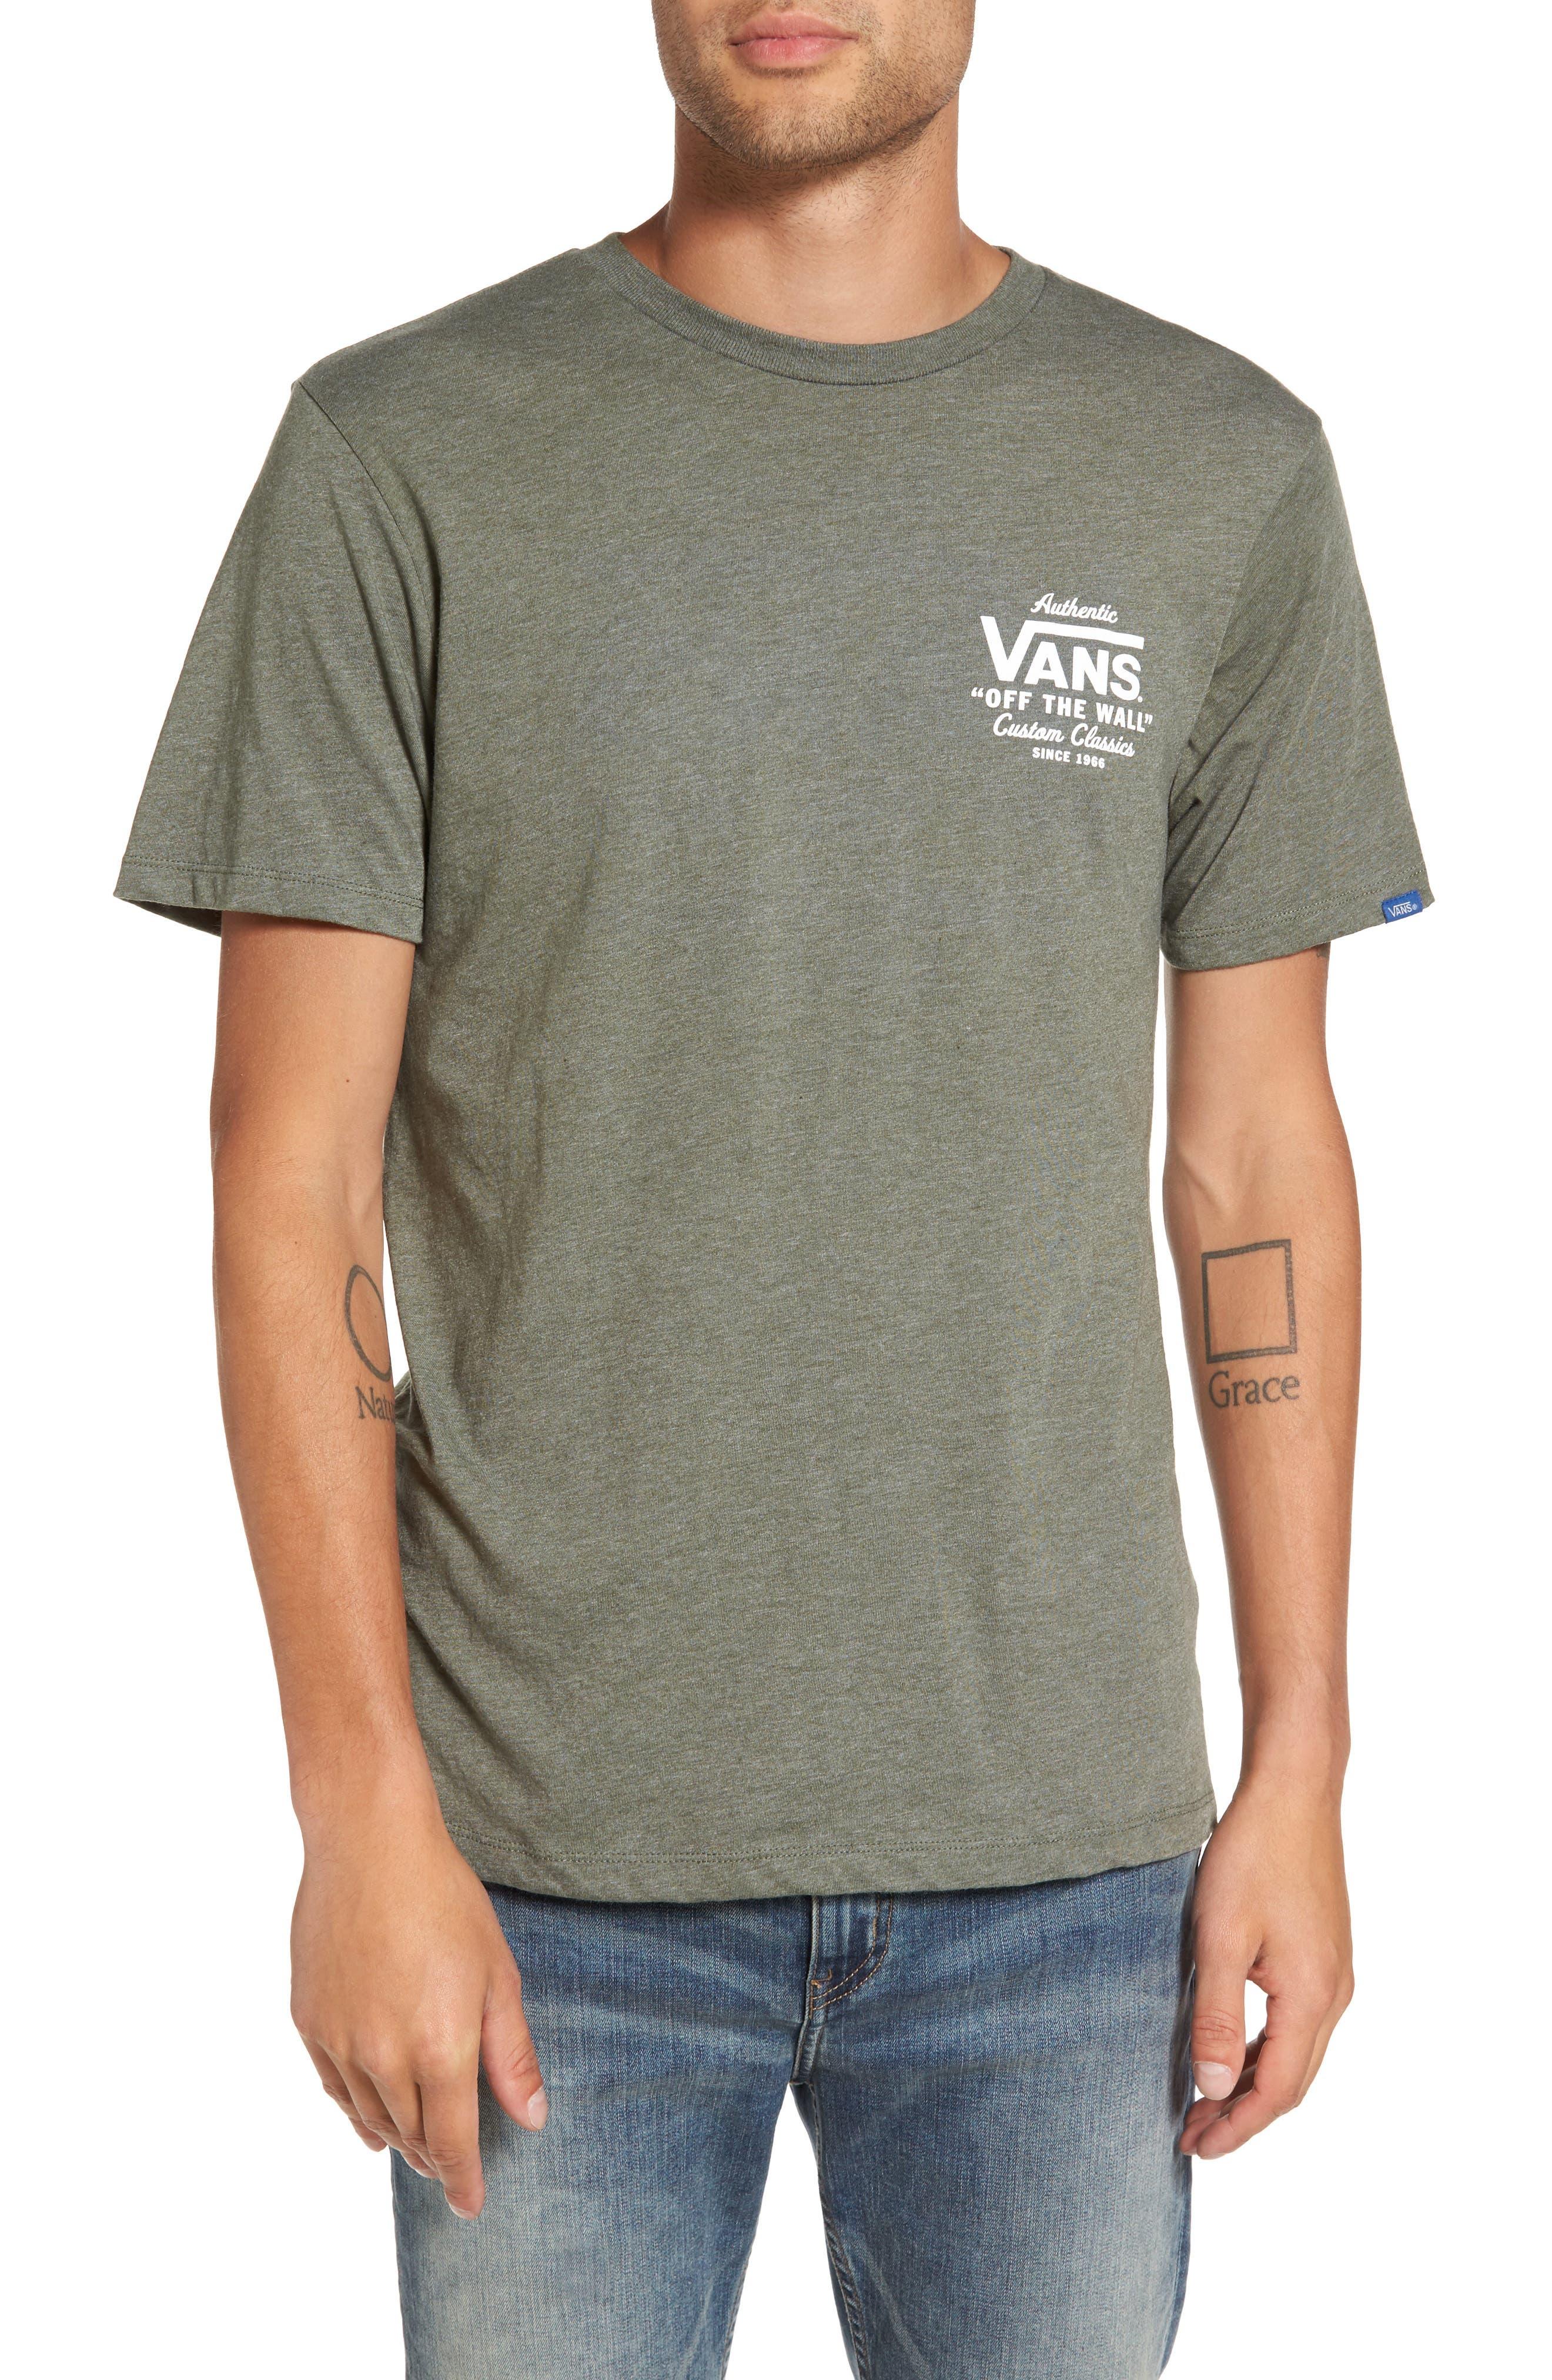 Vans Holder Street II Graphic T-Shirt